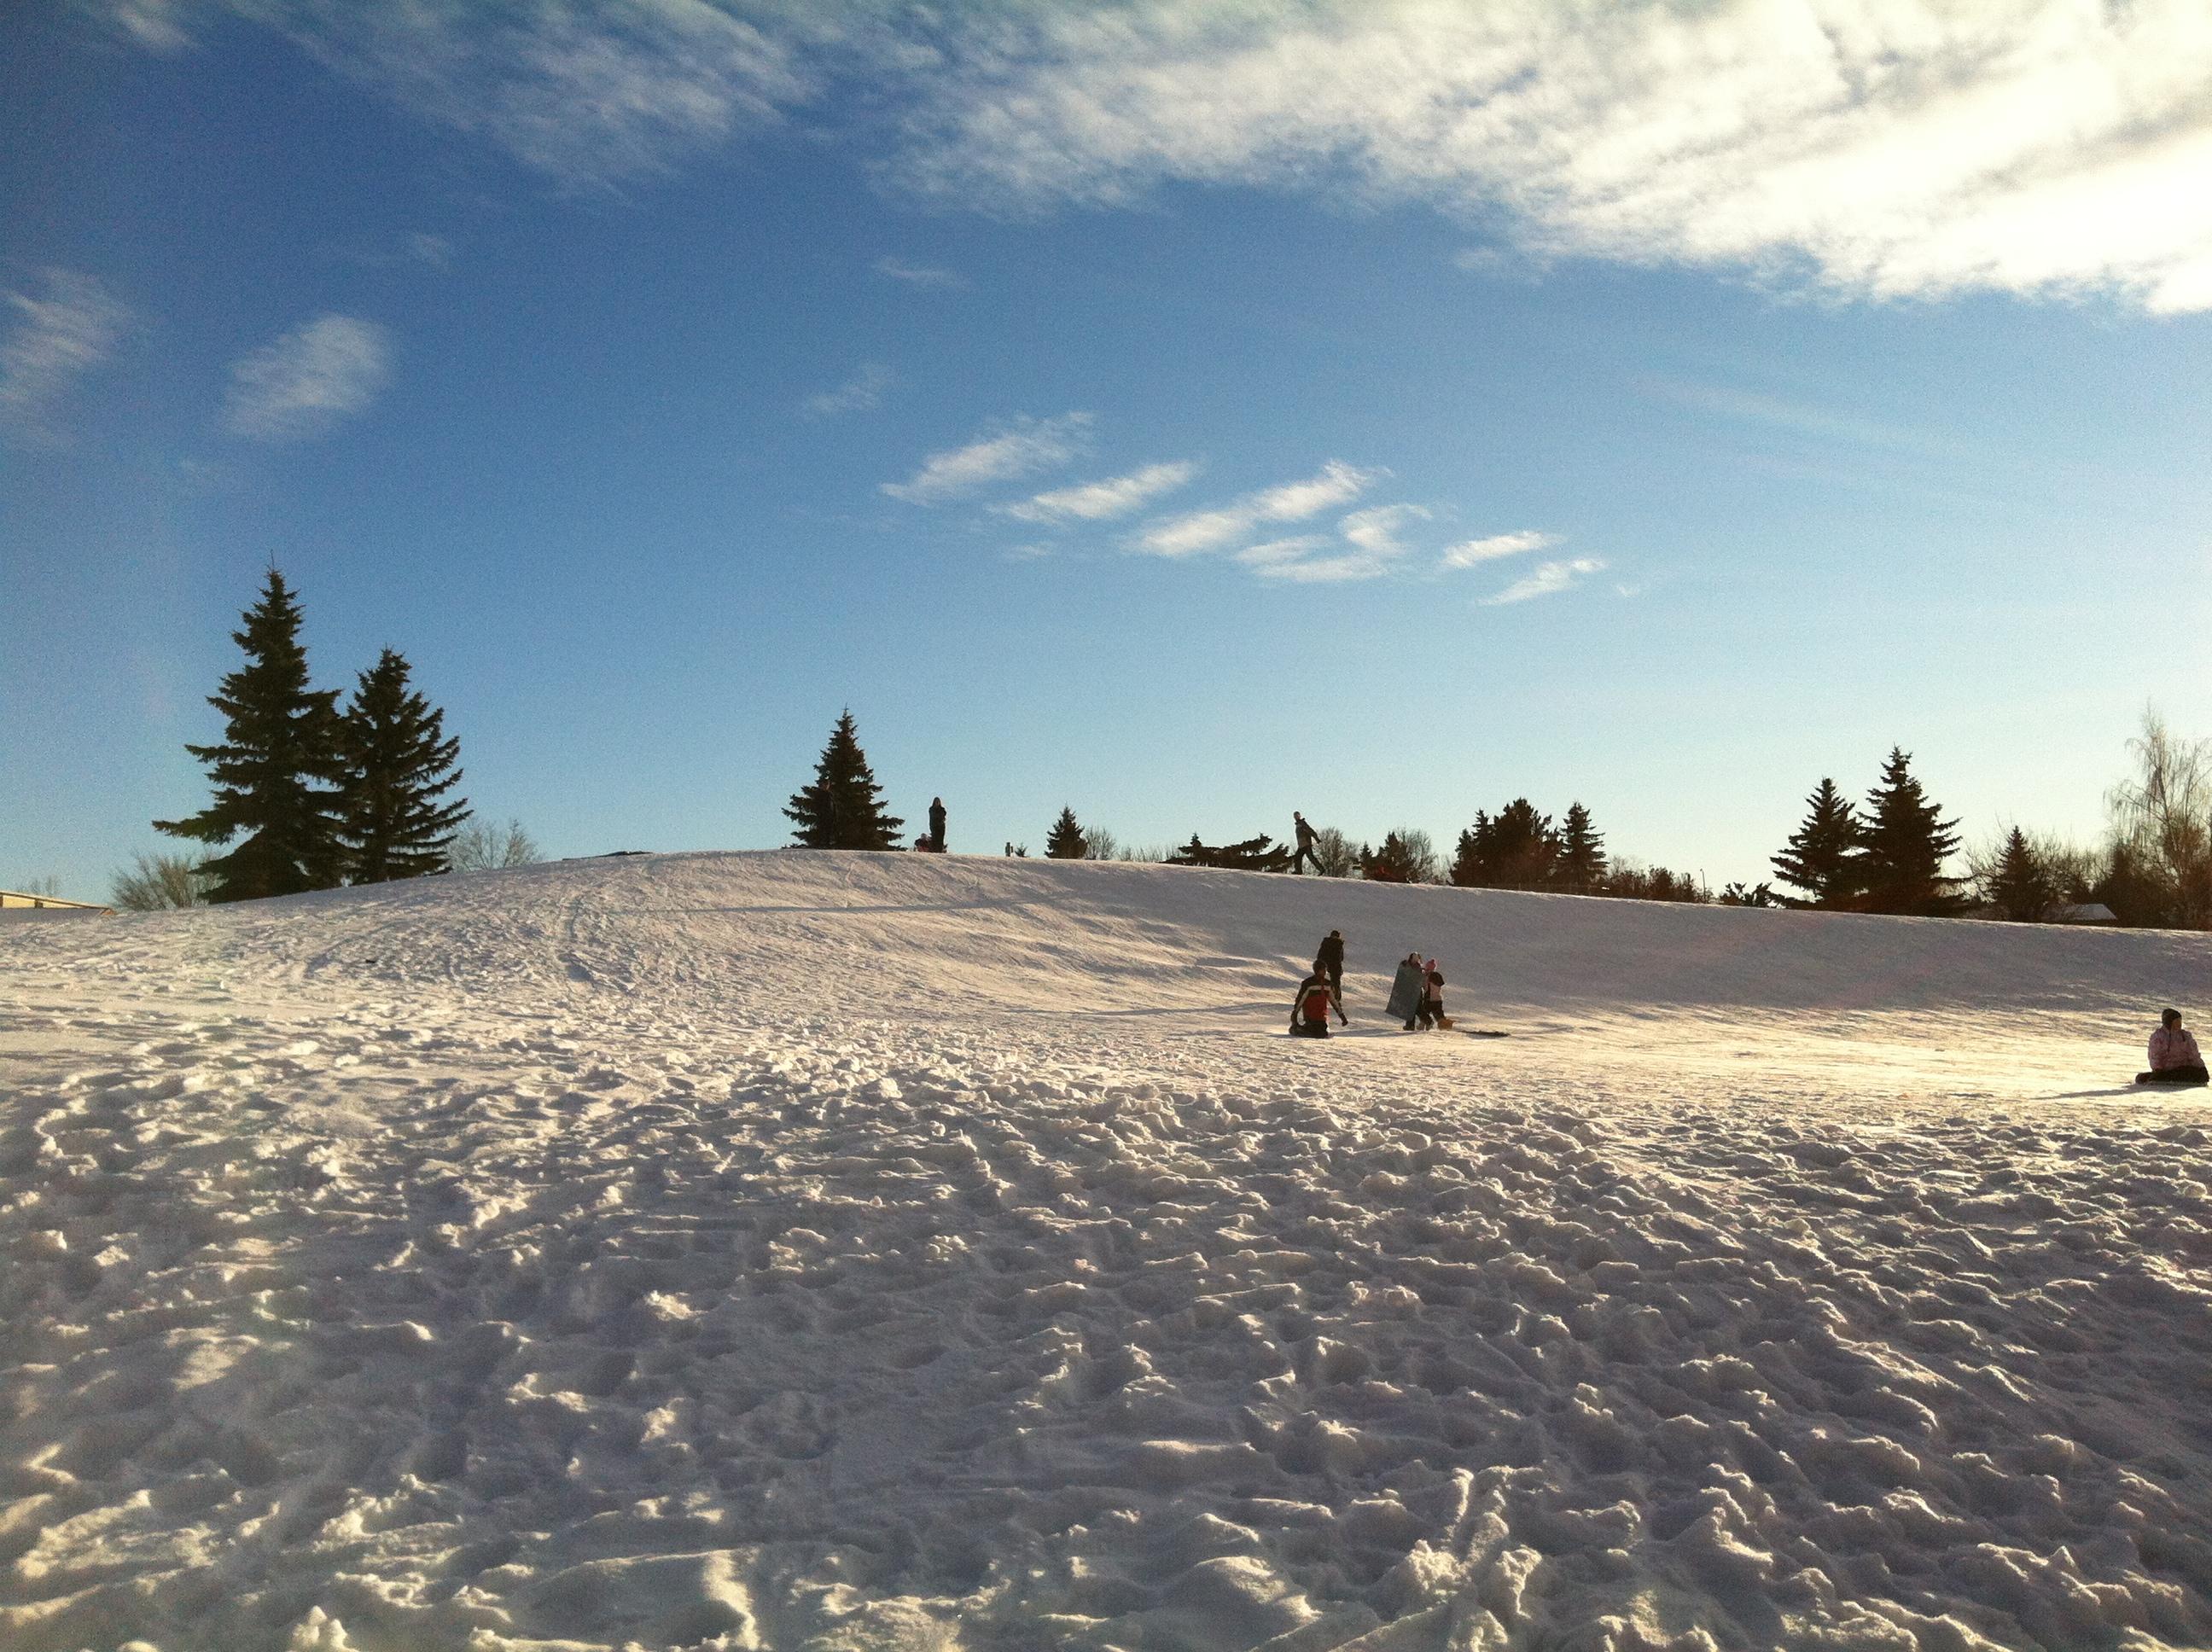 Cres Hts Toboggan hill Feb 2012 (4).JPG